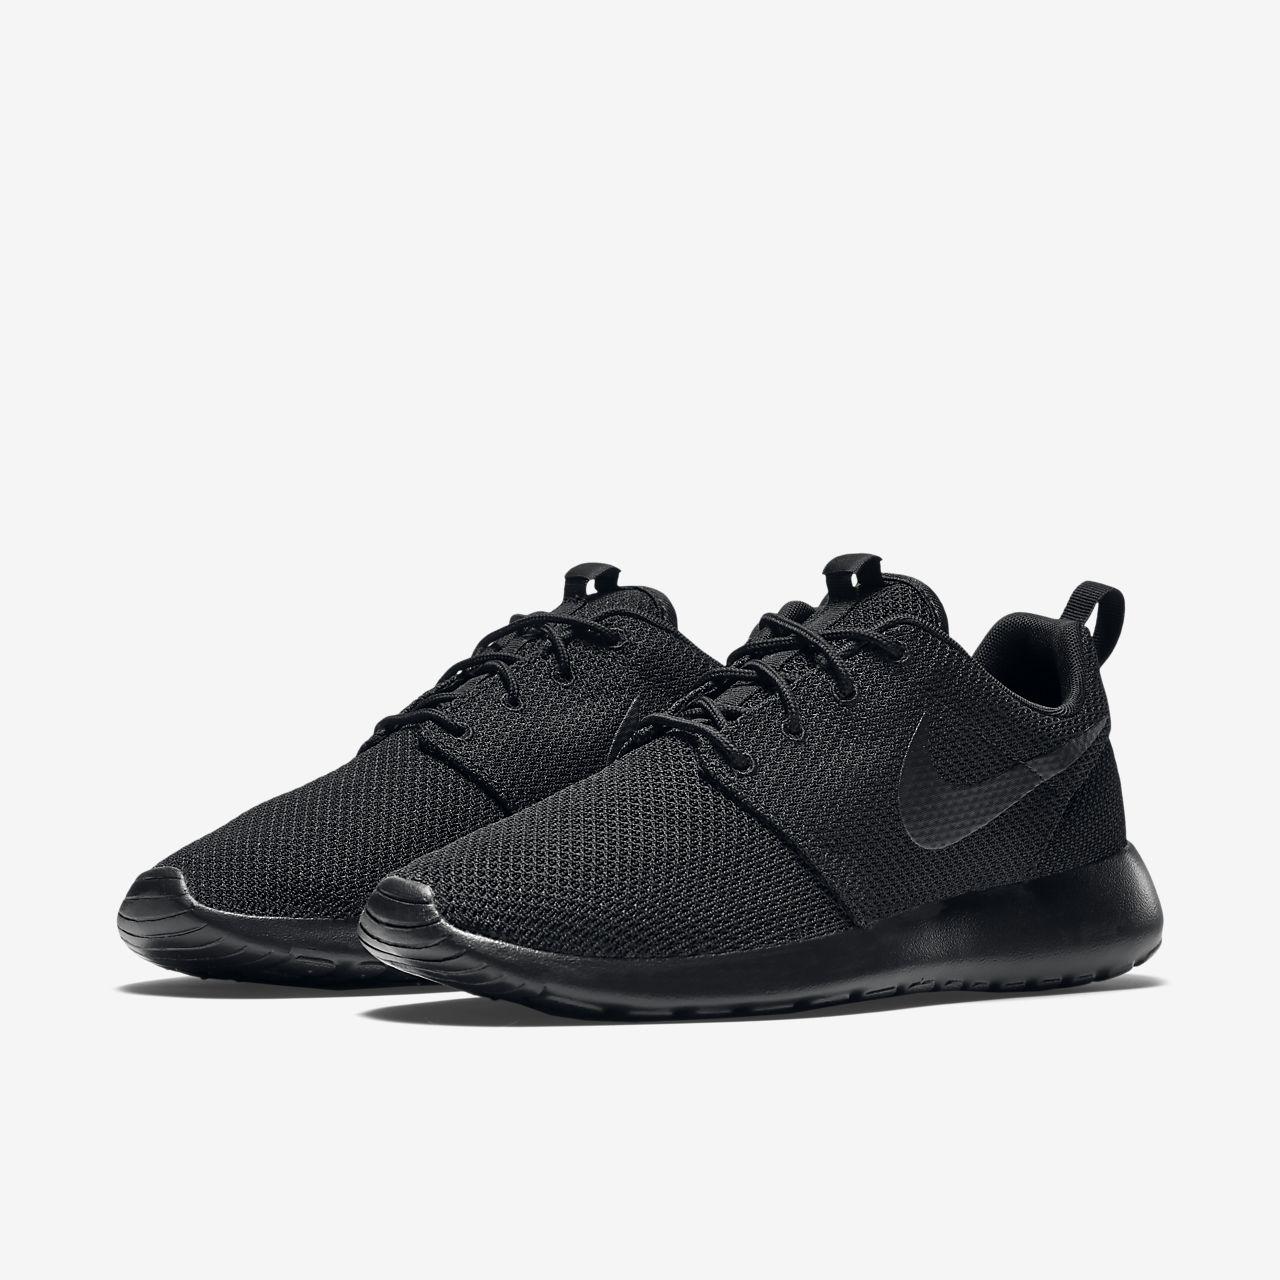 separation shoes 276aa f33cc ... Nike Roshe One Men s Shoe